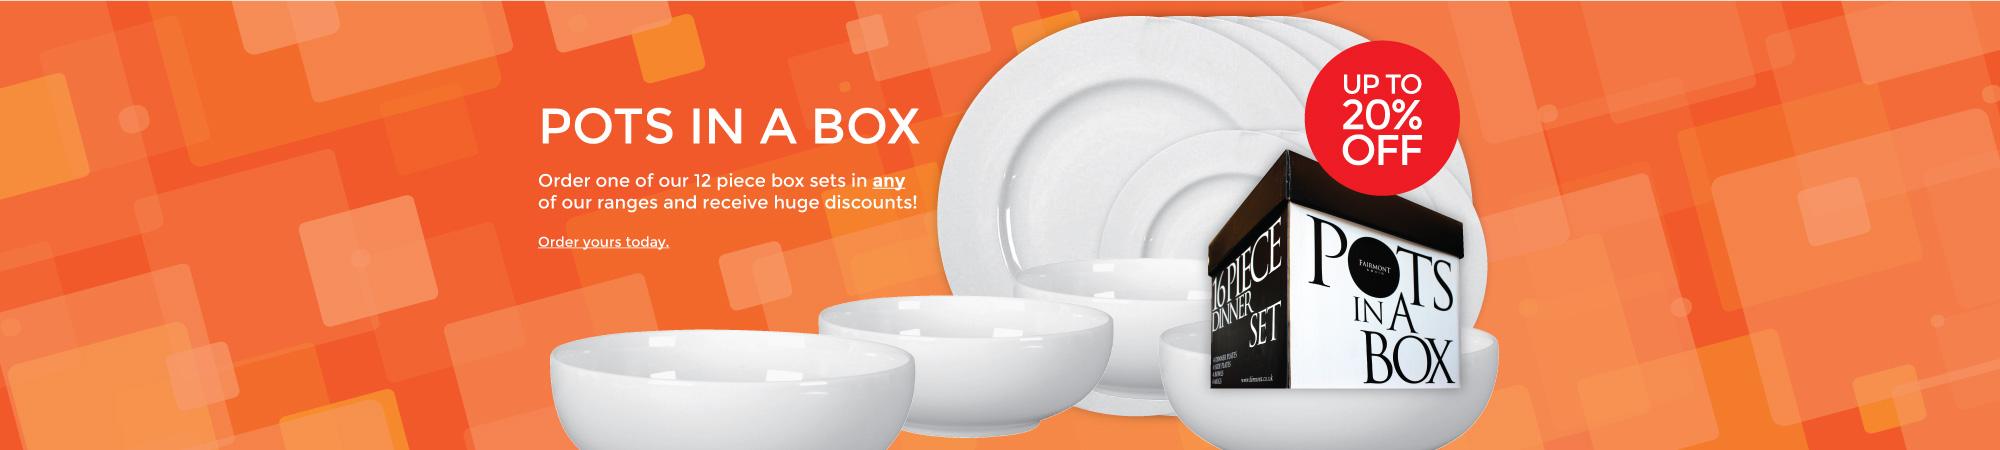 Fairmont & Main Pots in a Box